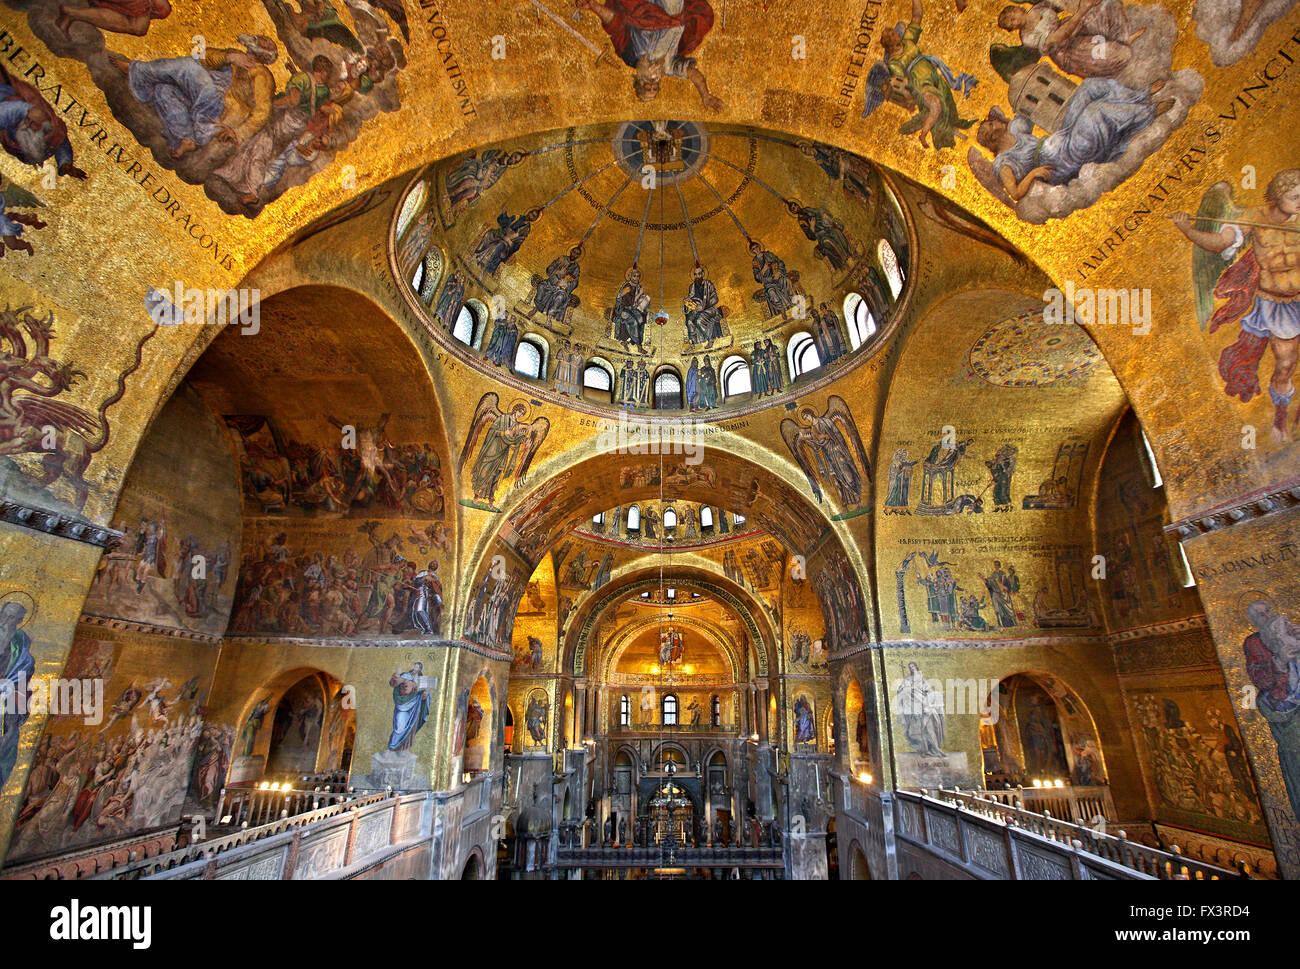 Amazing mosaics inside the basilica di san marco st mark for Esterno basilica di san marco